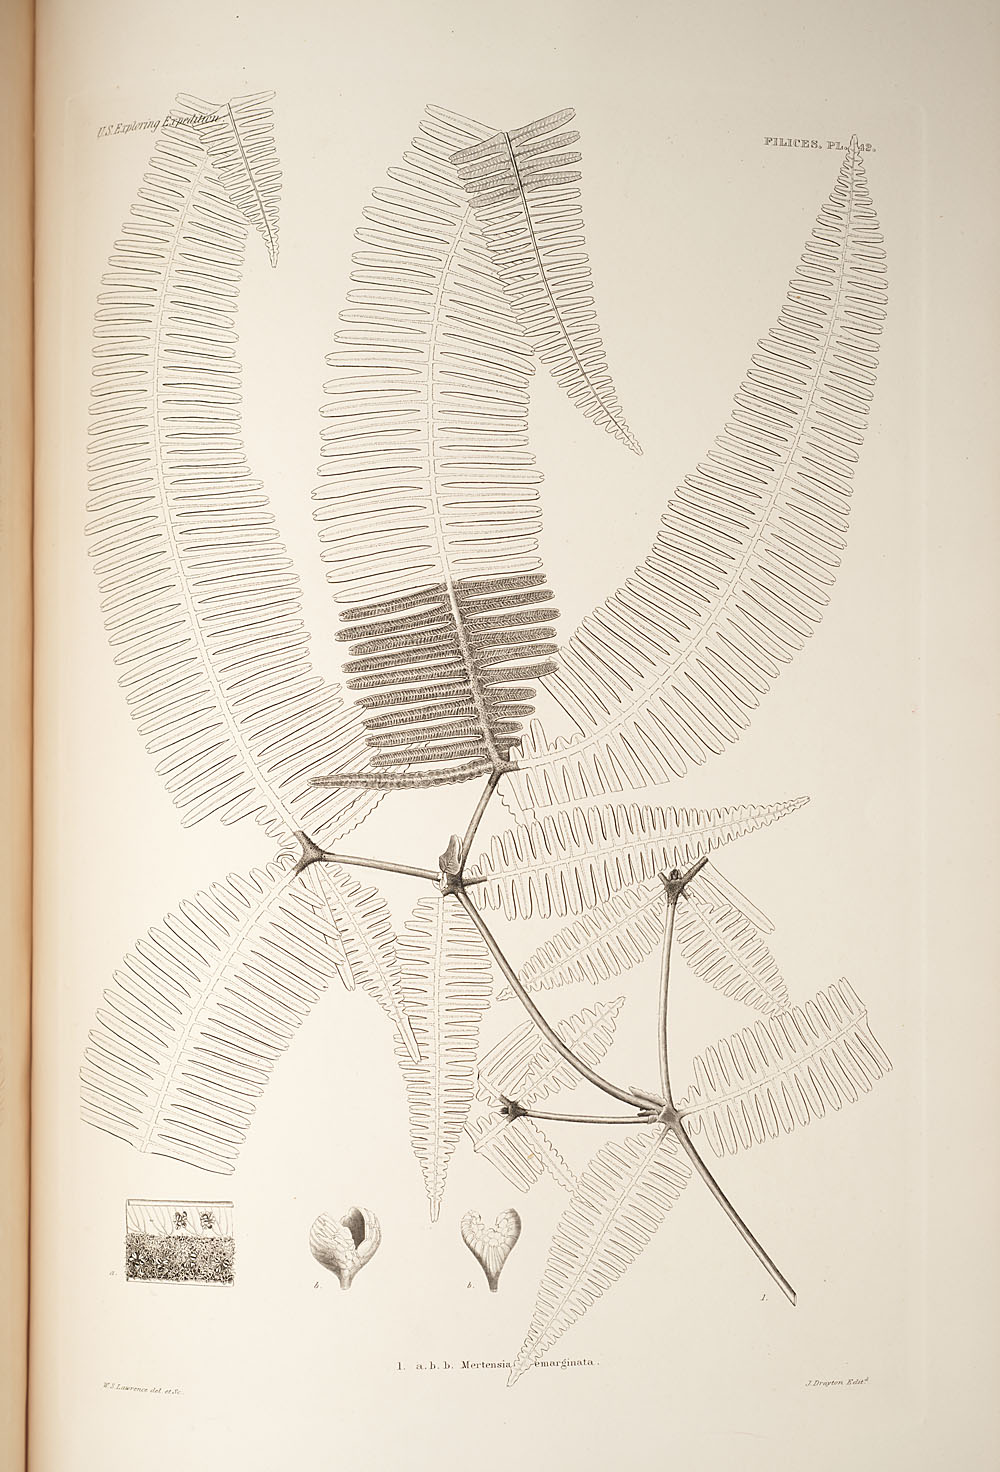 Fig. 1. Mertensia emarginata,  Image number:SIL19-24a-054